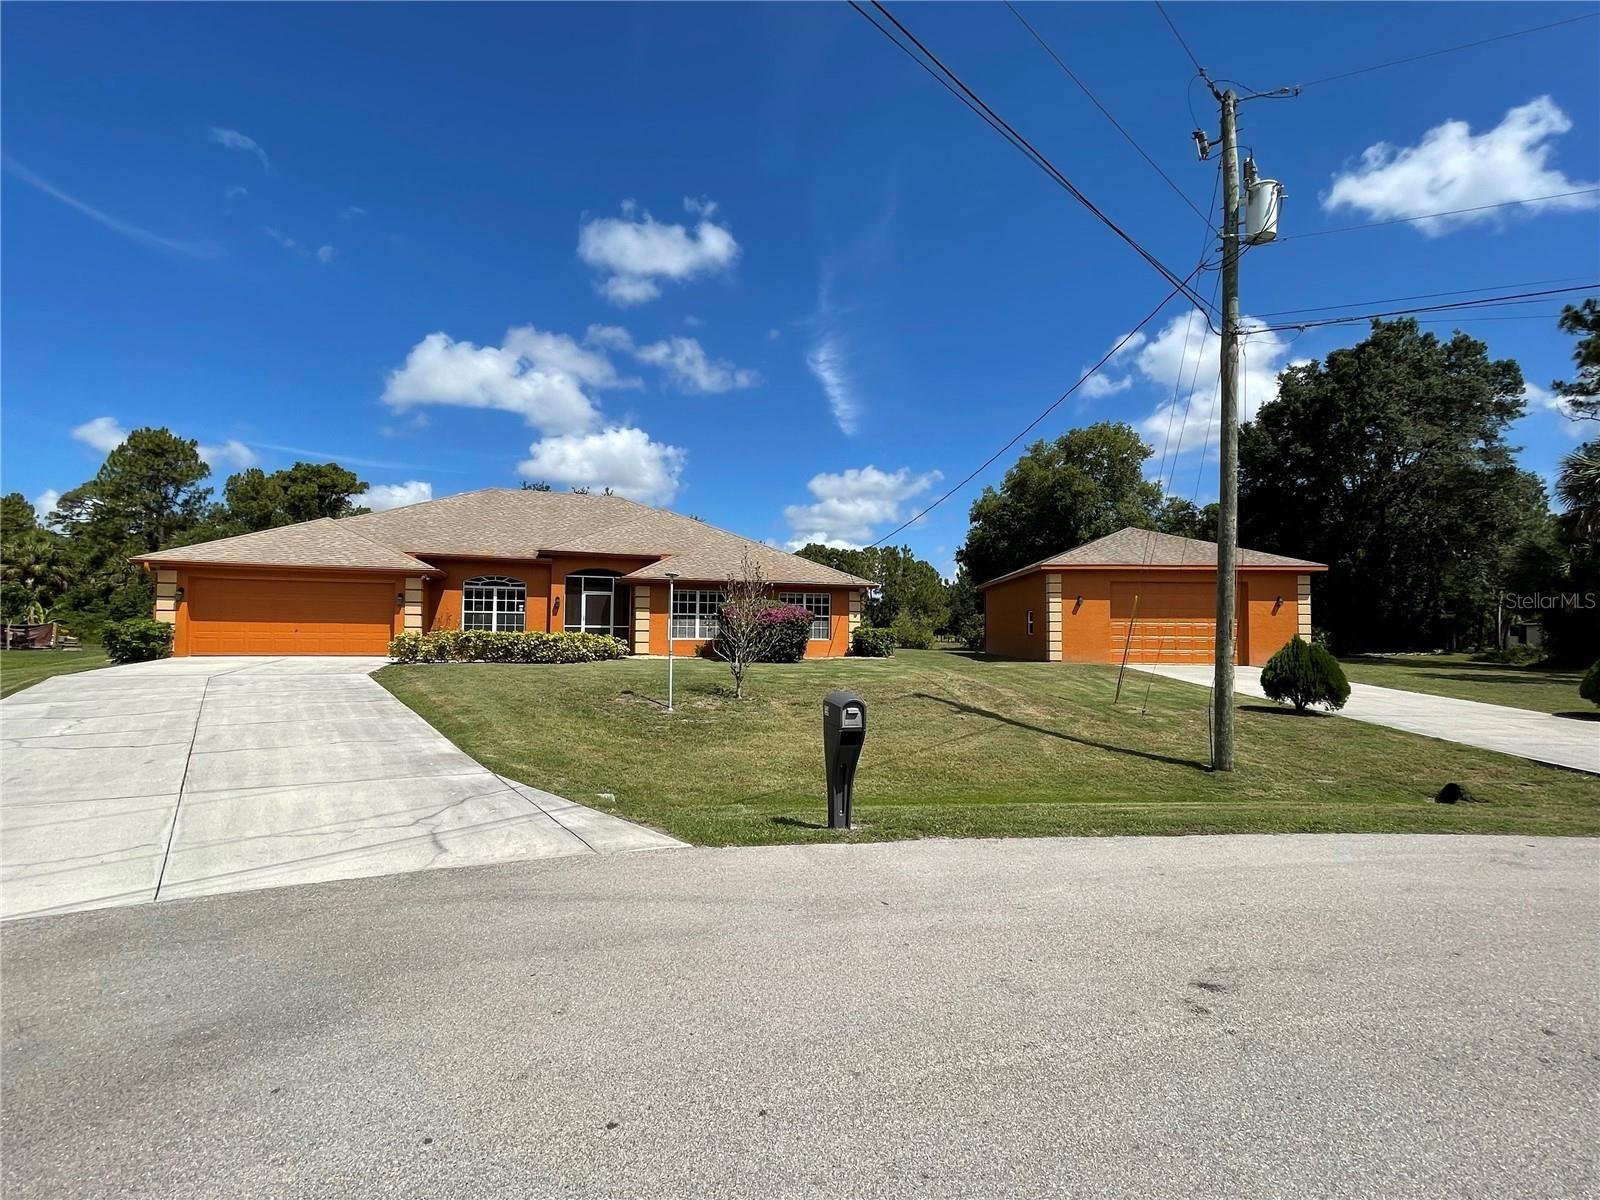 Photo of 2559 WILBURN TERRACE, NORTH PORT, FL 34288 (MLS # C7444465)